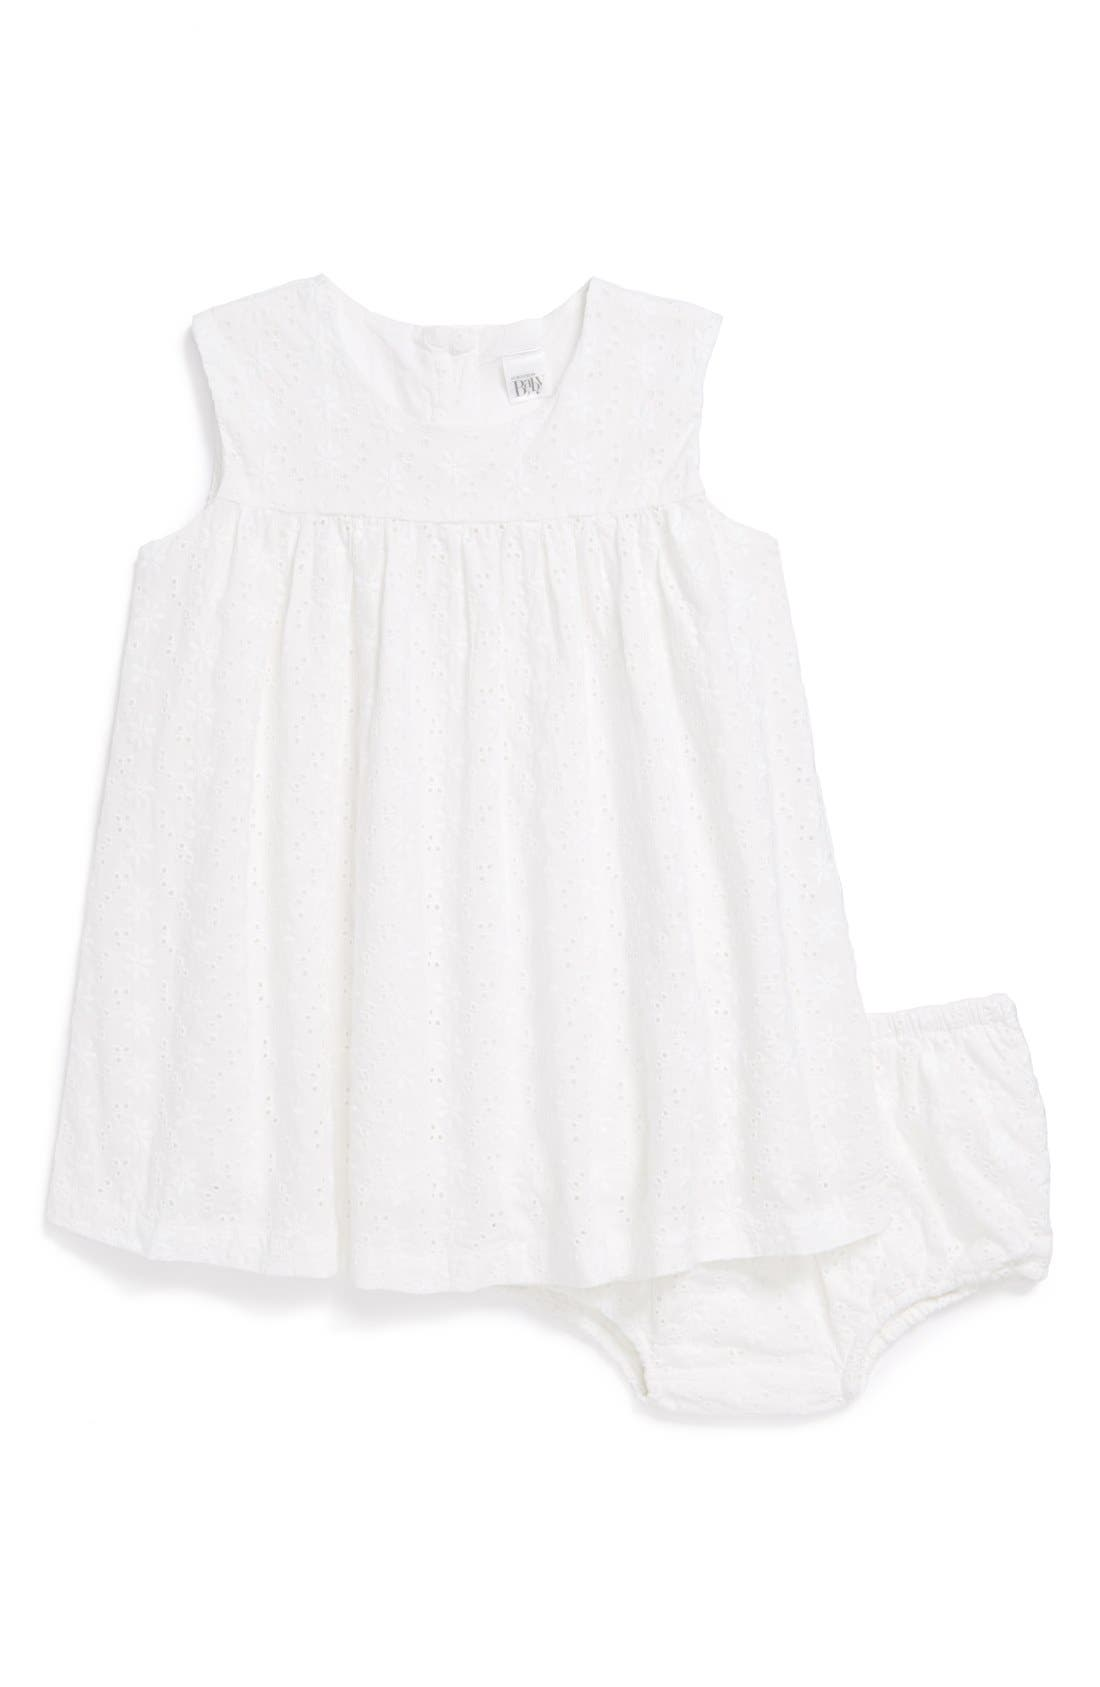 NORDSTROM BABY,                             Eyelet Dress & Bloomers,                             Main thumbnail 1, color,                             100